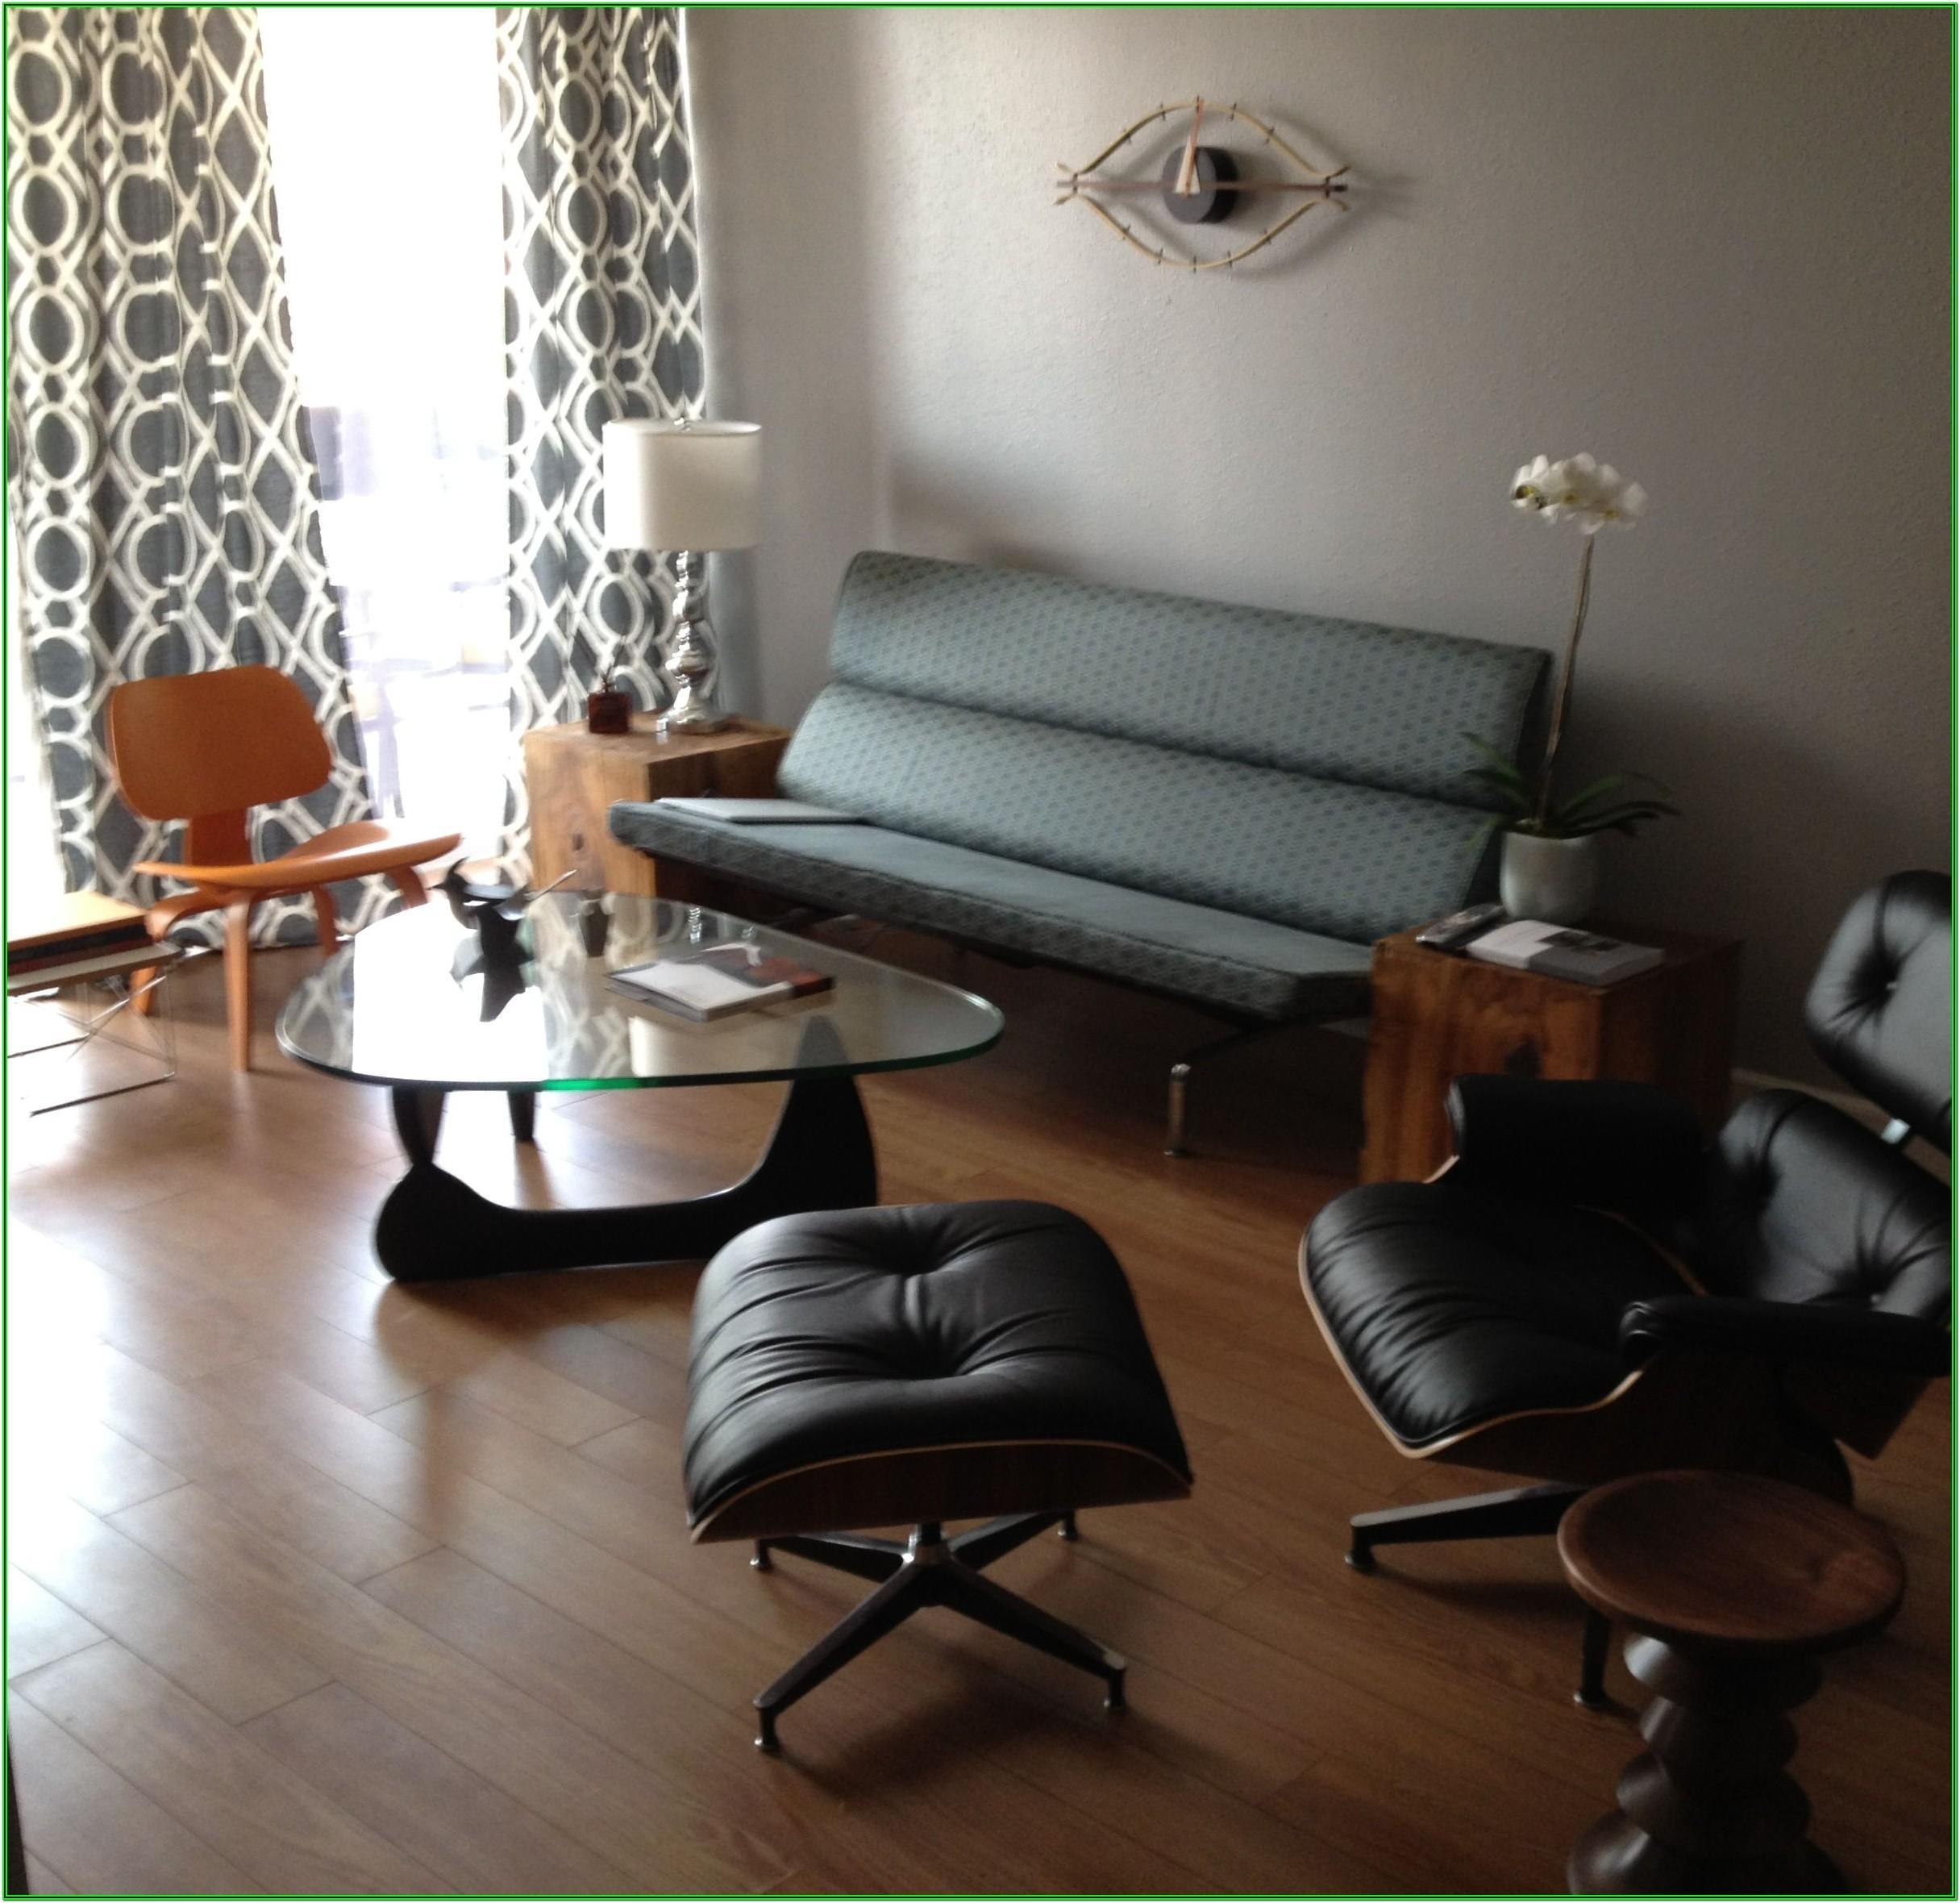 Herman Miller Eames Chair Living Room